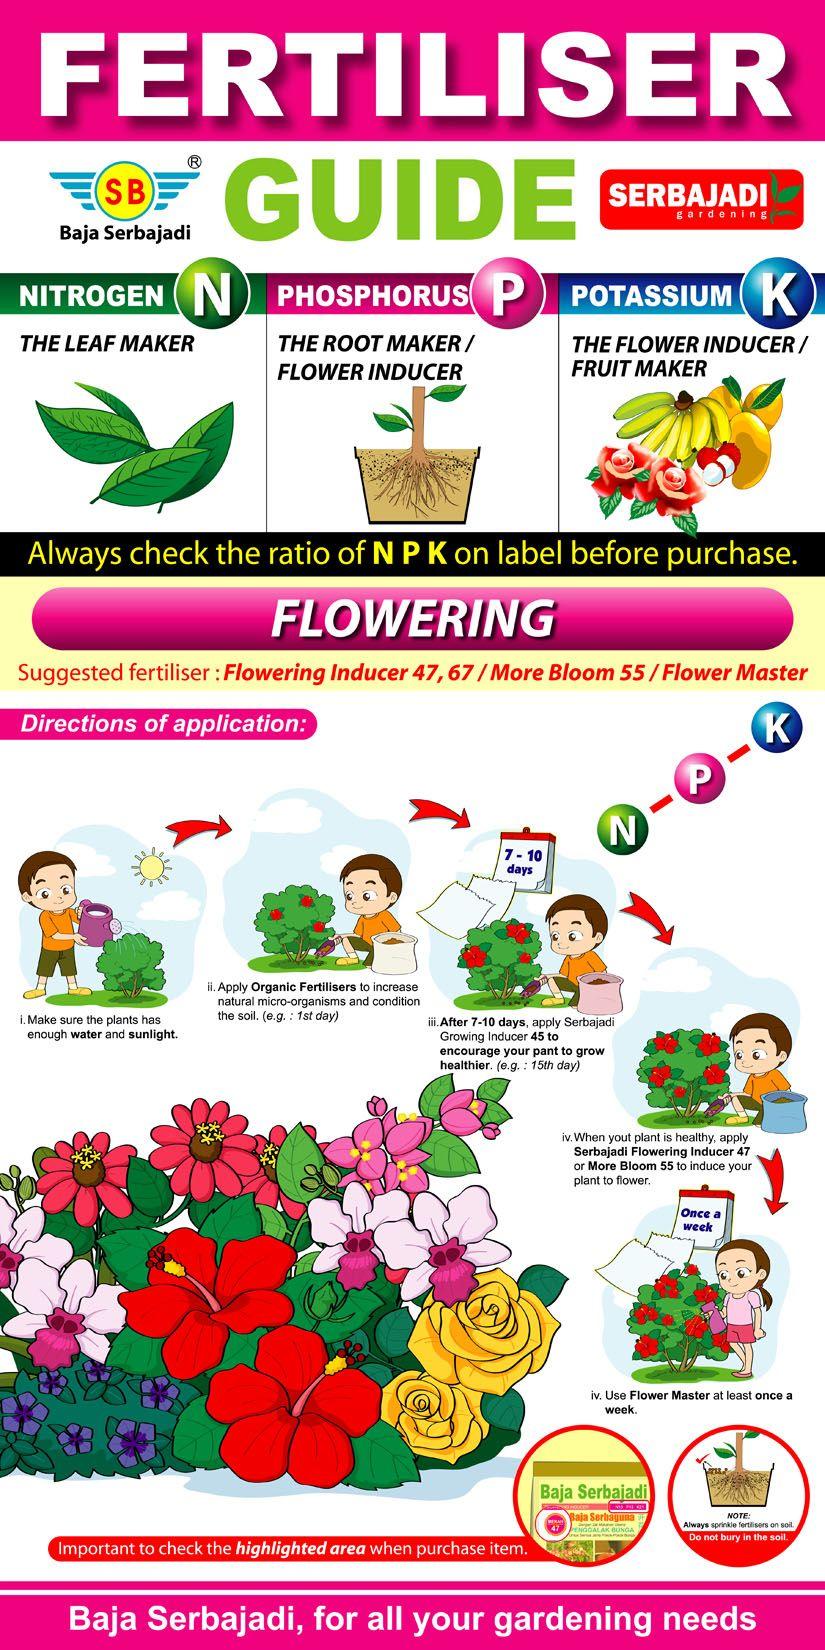 Fertilizer Infographic from a fabulous blog Gardening